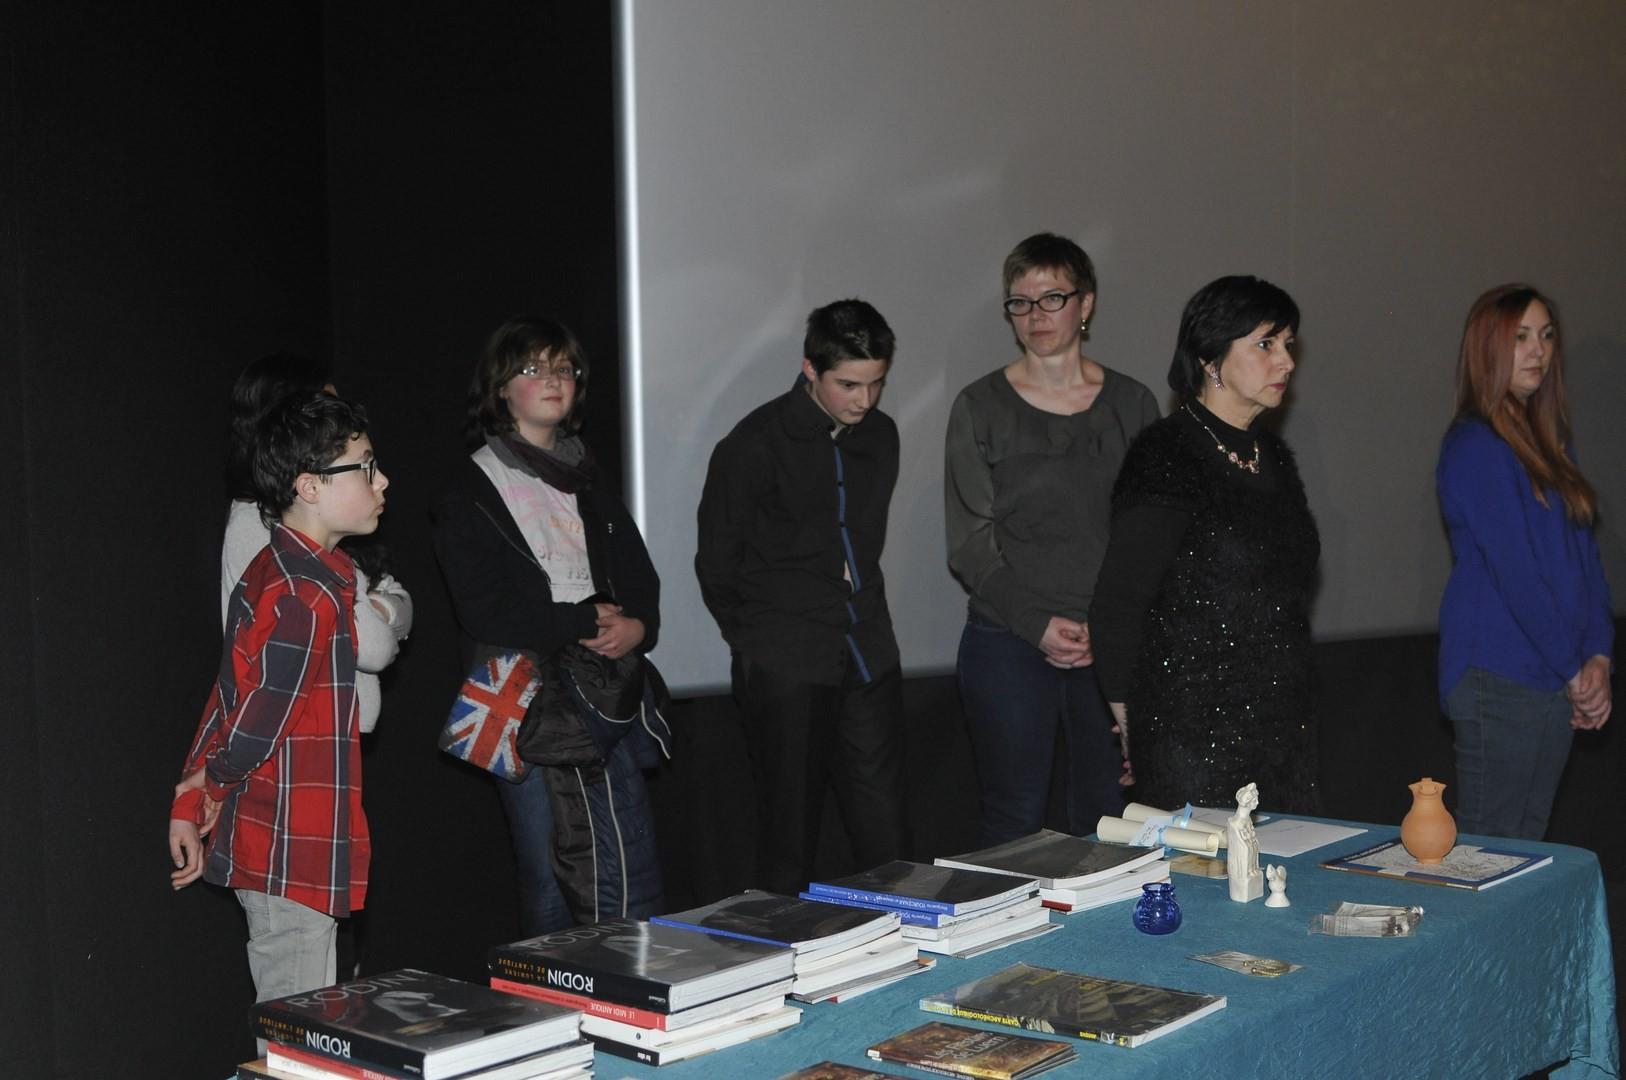 A gagnser : des lots de catalogues d'expos, des reconstitutions d'objets...